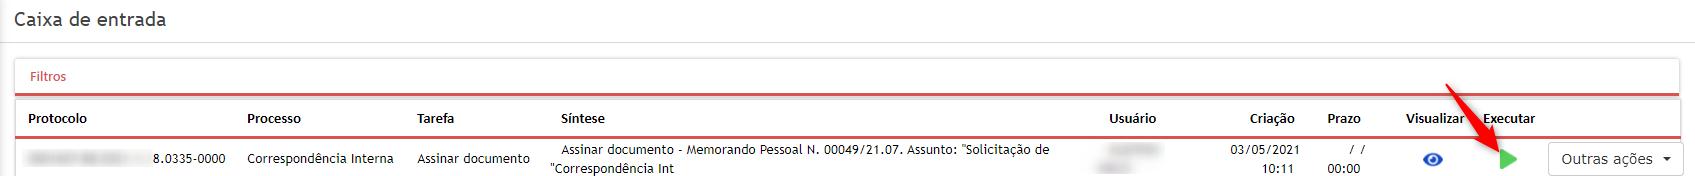 Executar-Assinar-Processo.png